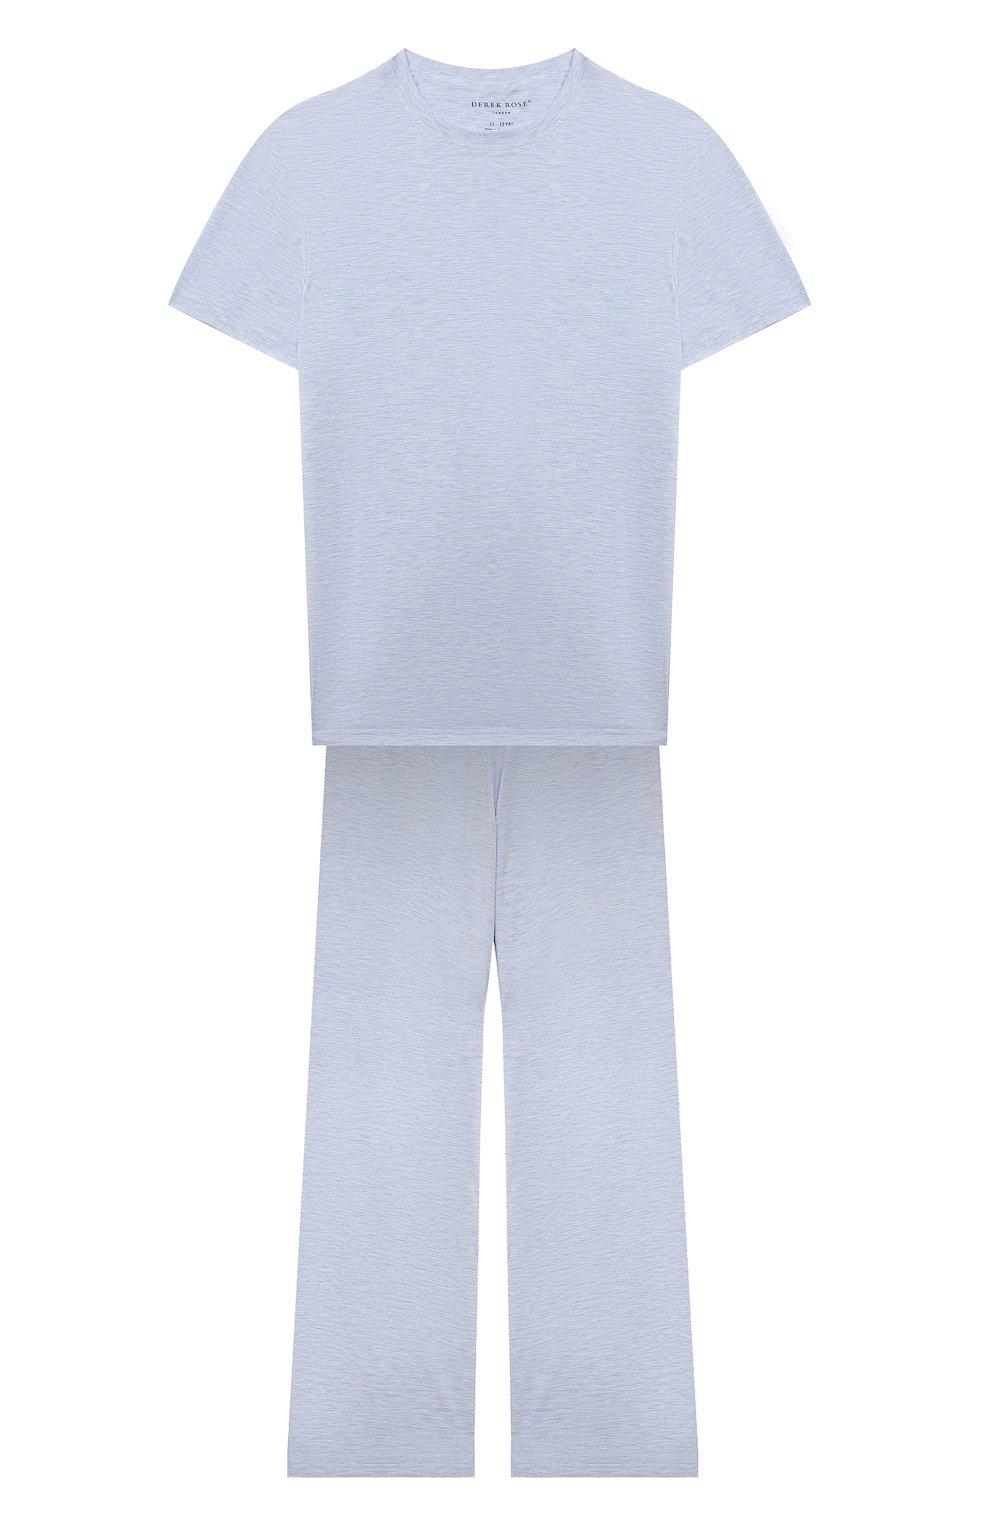 Детская пижама DEREK ROSE голубого цвета, арт. 7251-ETHA001/3-12 | Фото 1